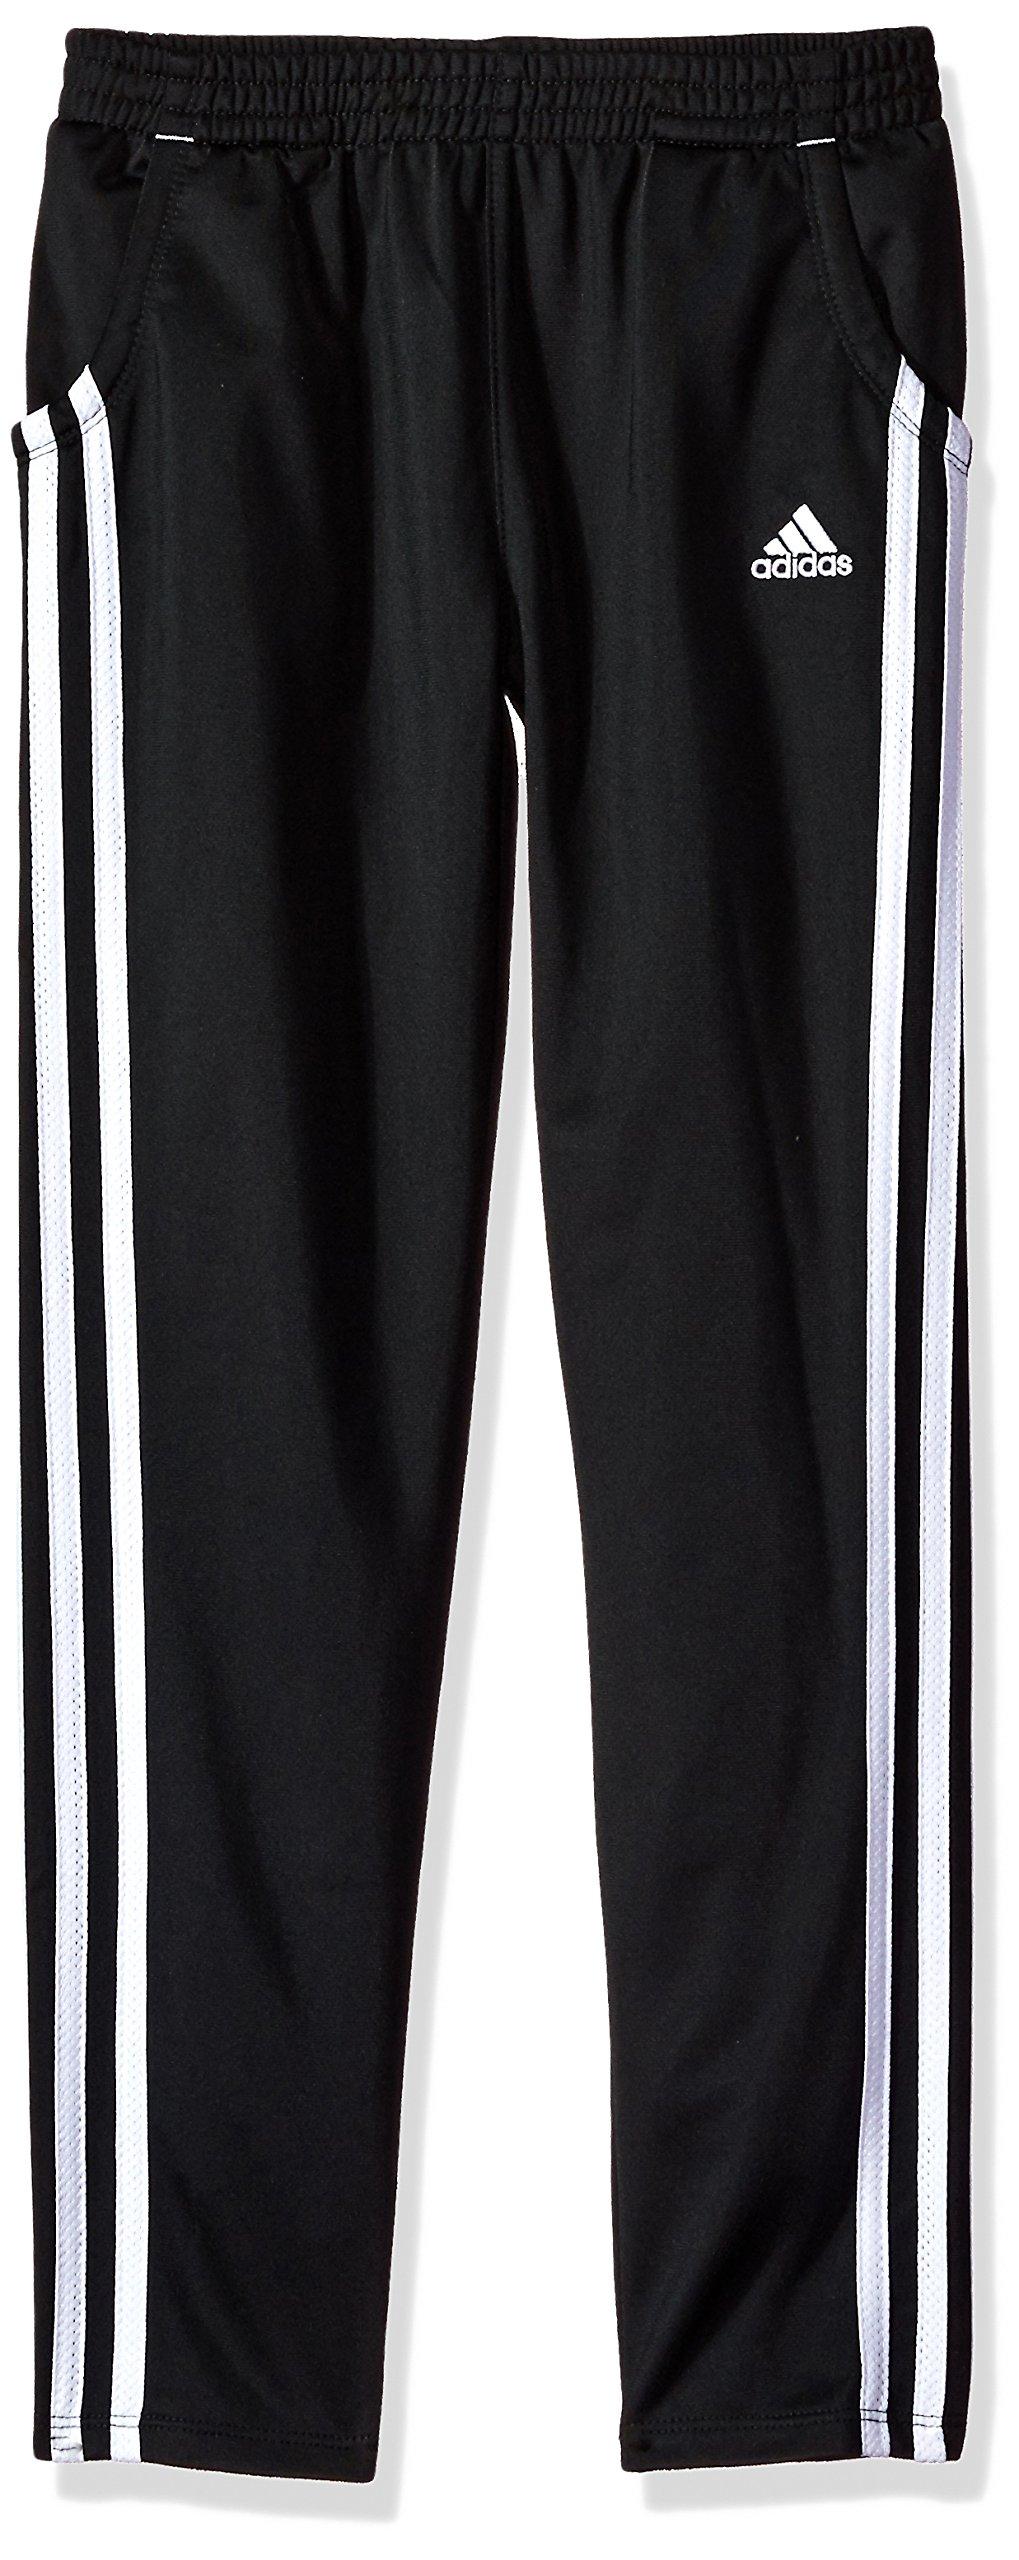 adidas Girls' Big Warm Up Tricot Pant, ADI Black, M (10/12) by adidas